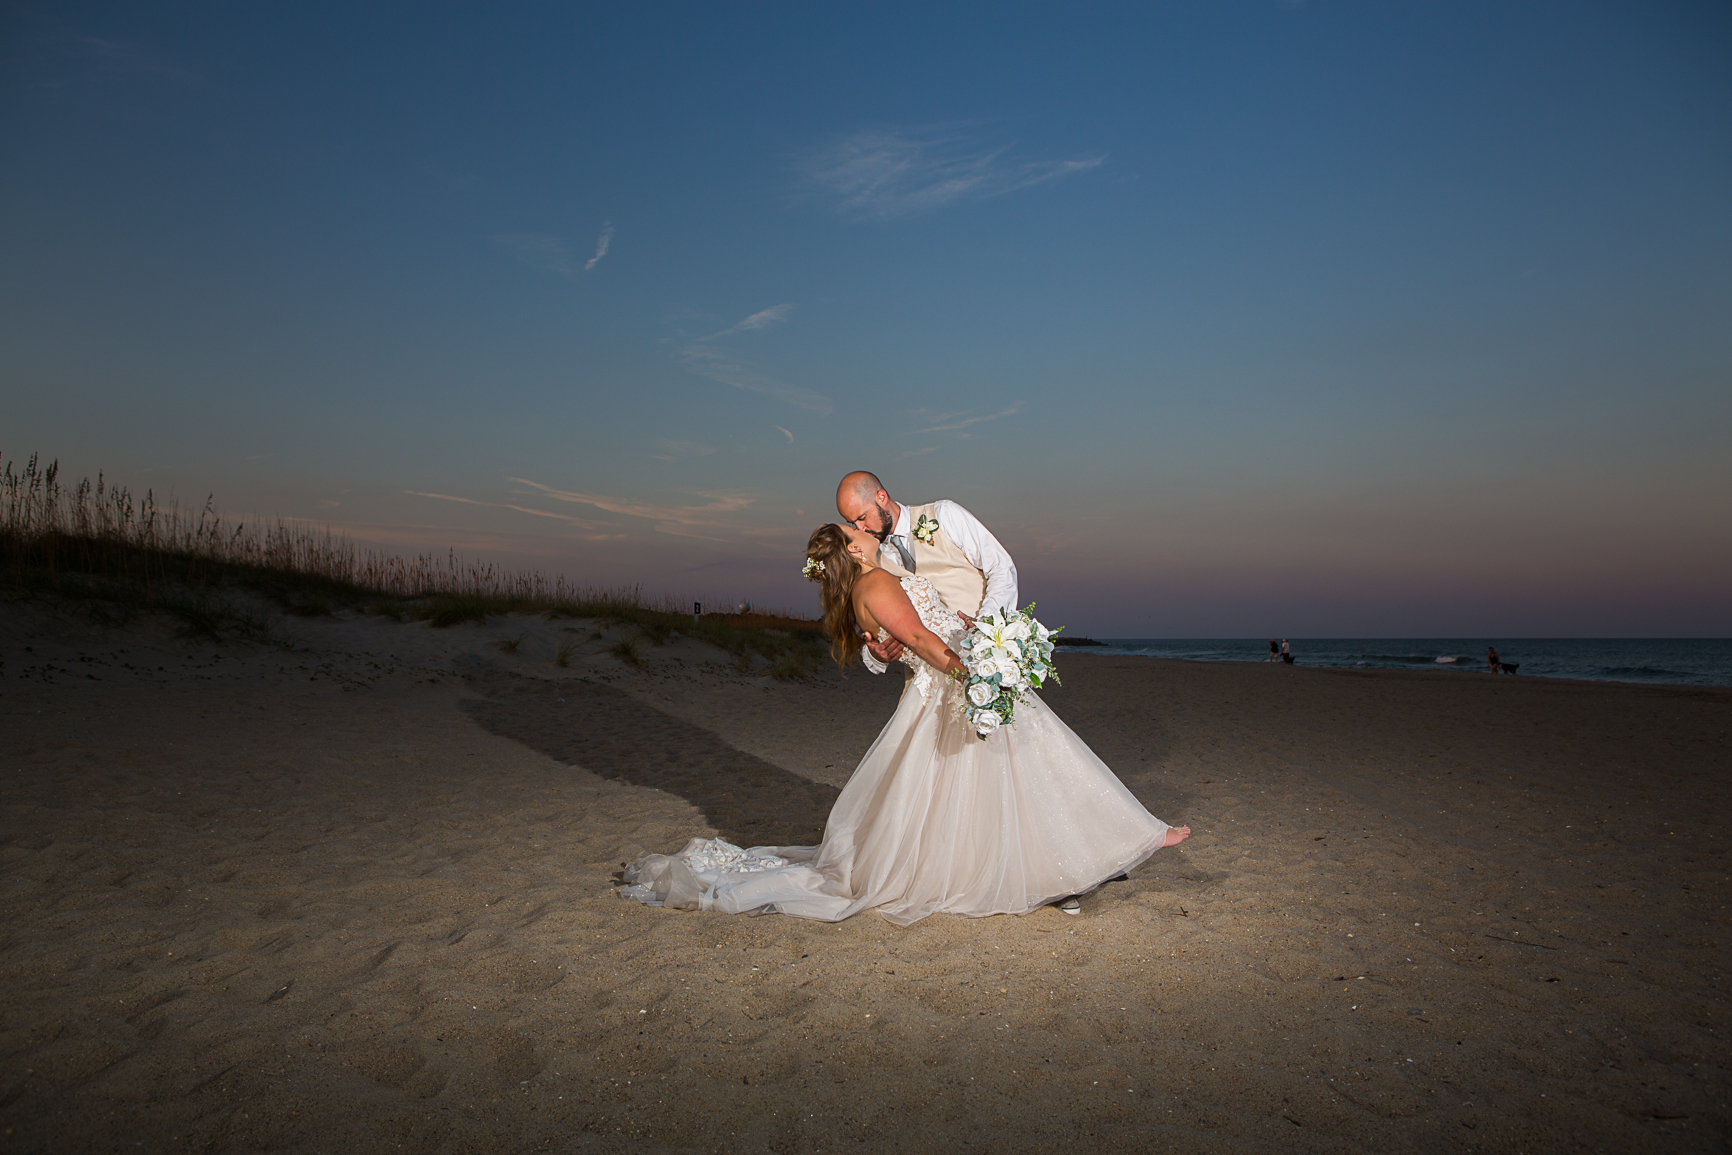 Raleigh wedding photographer - 101 studio llc -18.jpg